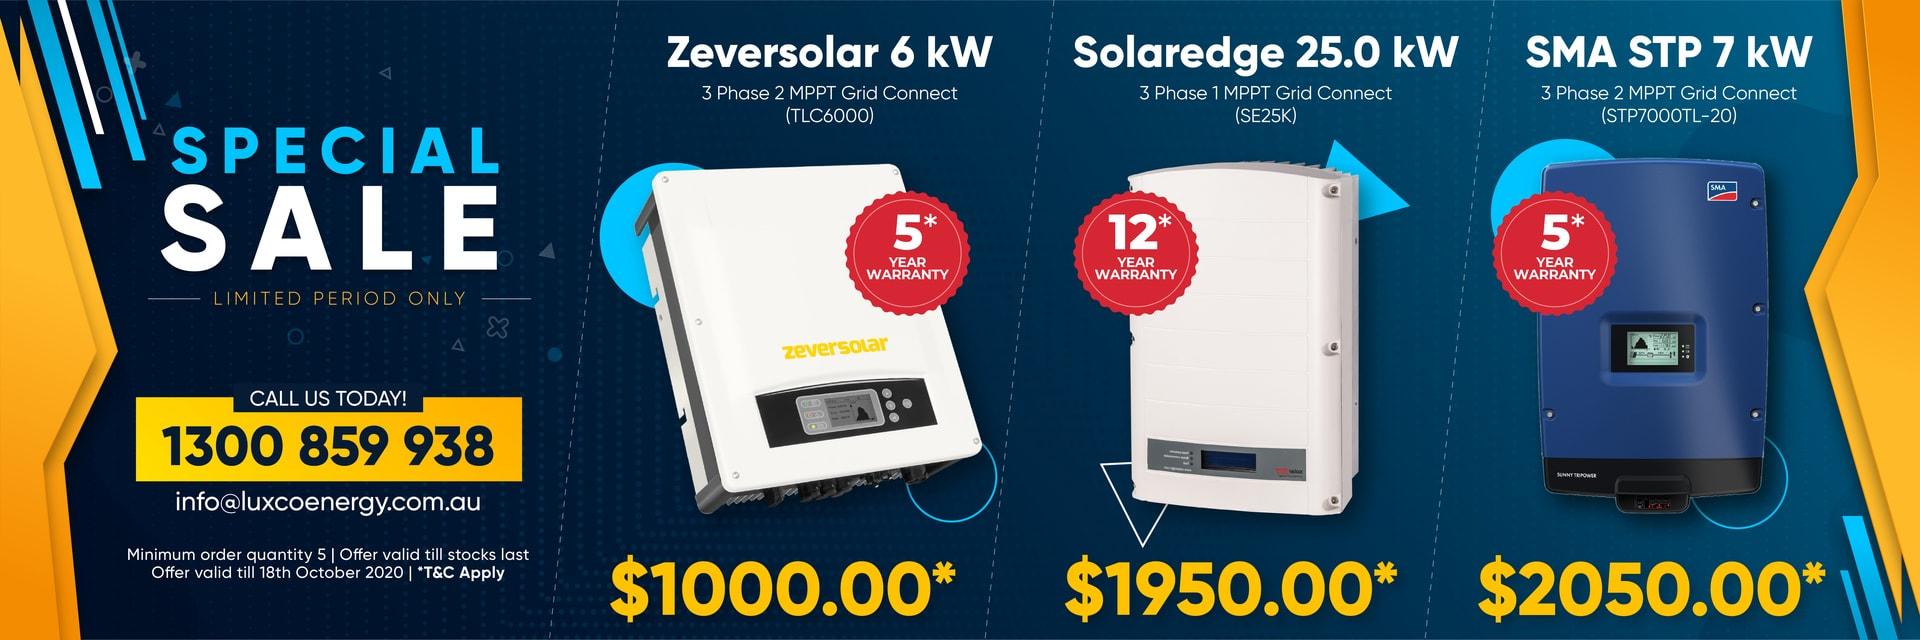 super wholesale solar sale luxco energy